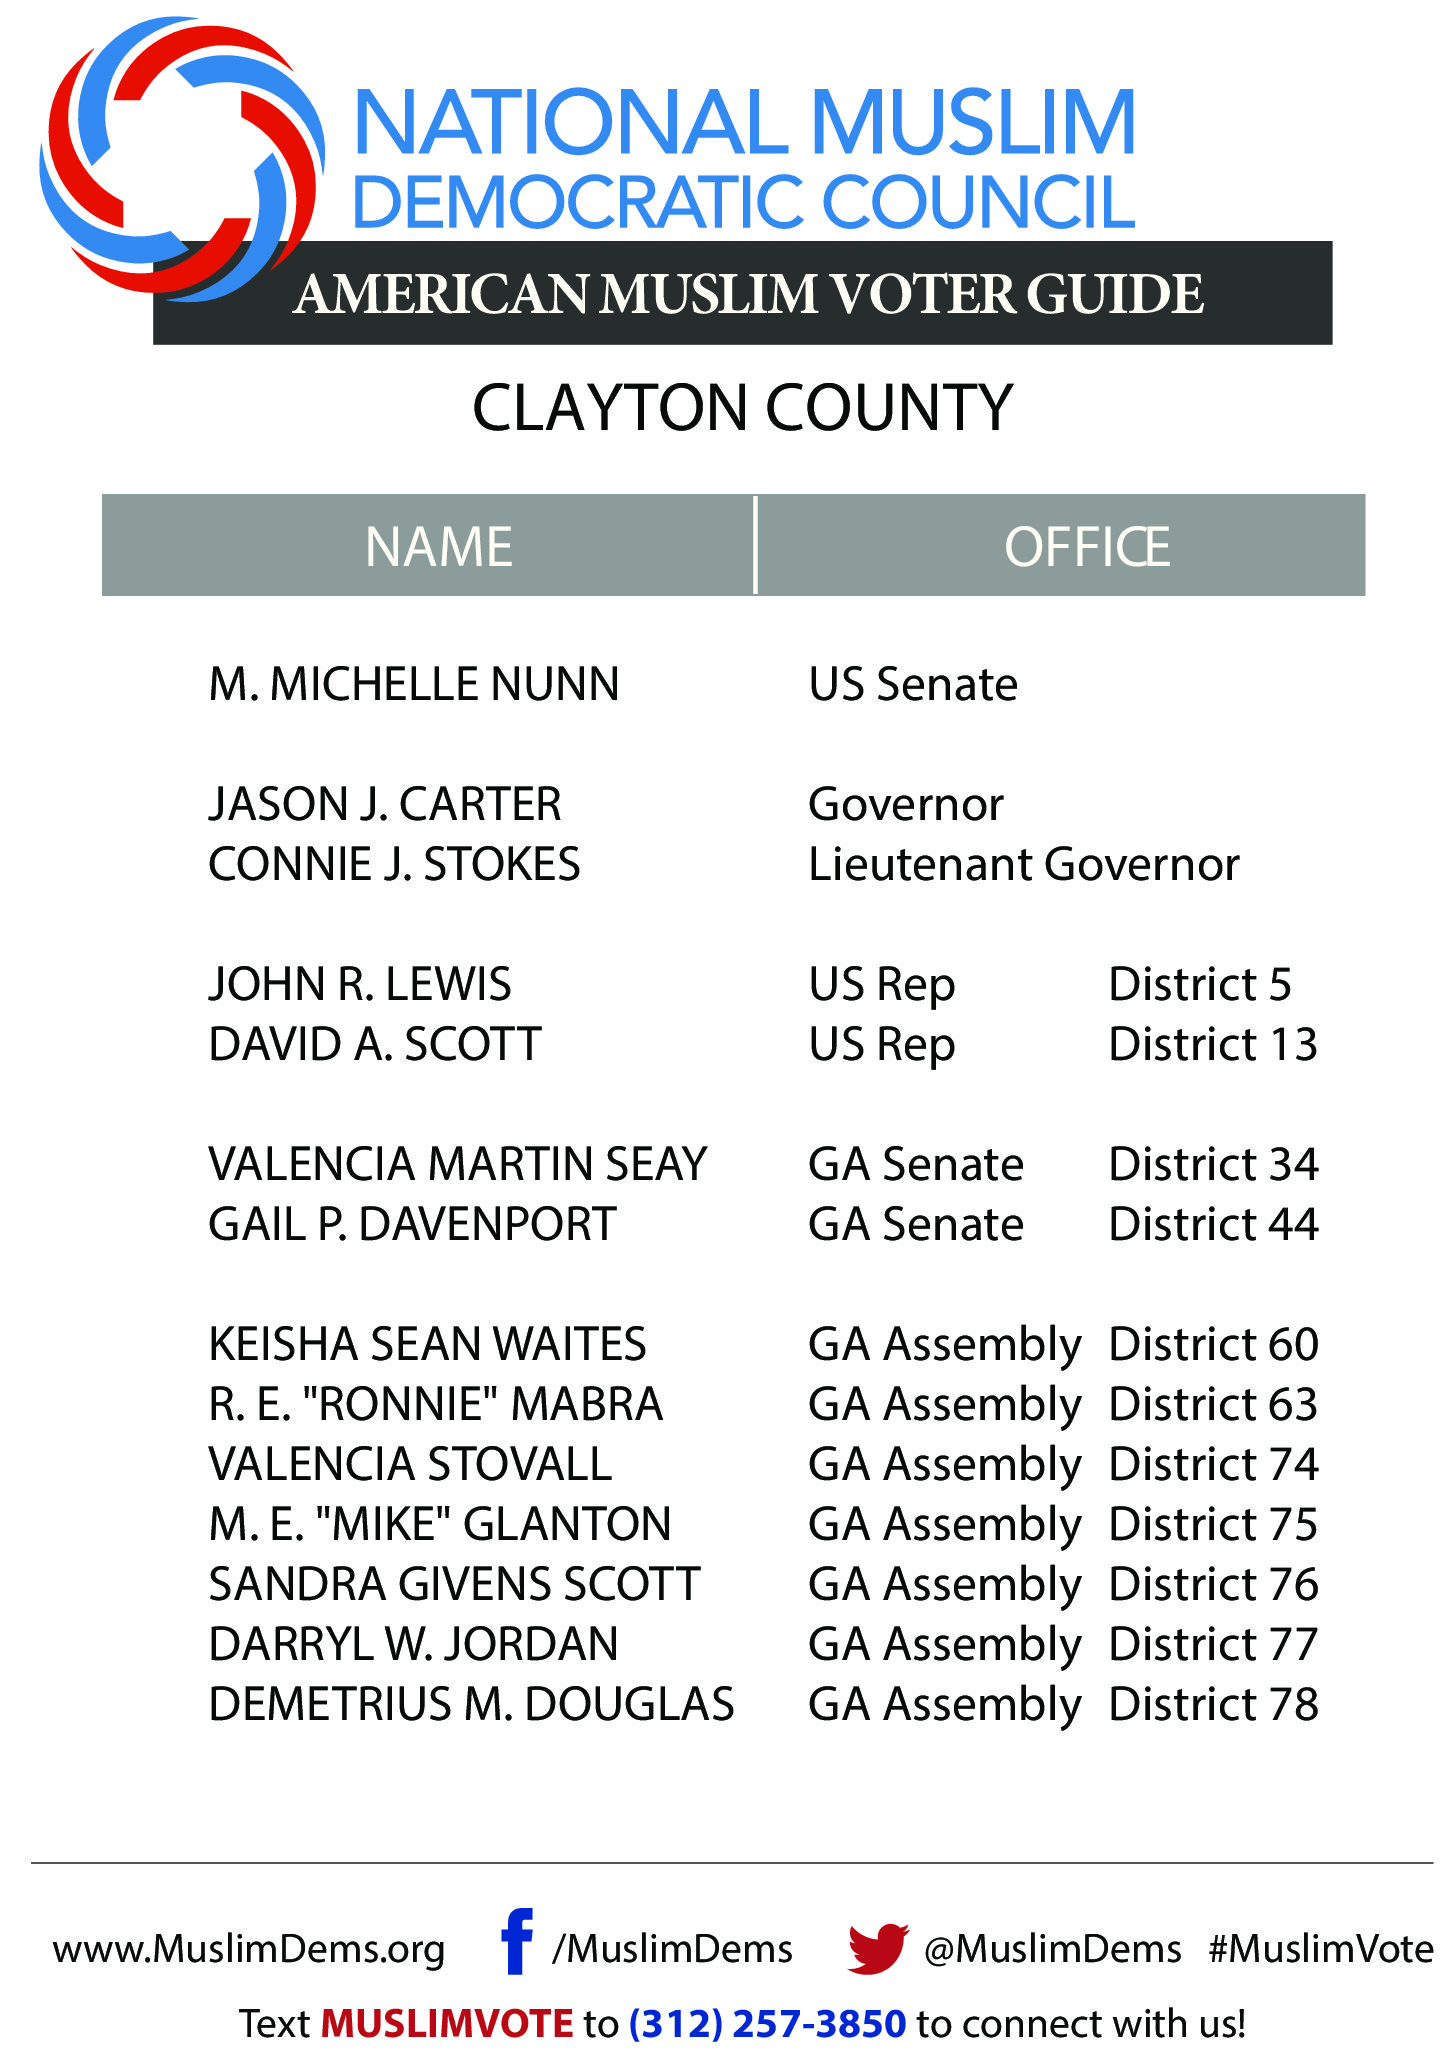 ClaytonATL_2014-page-0.jpg